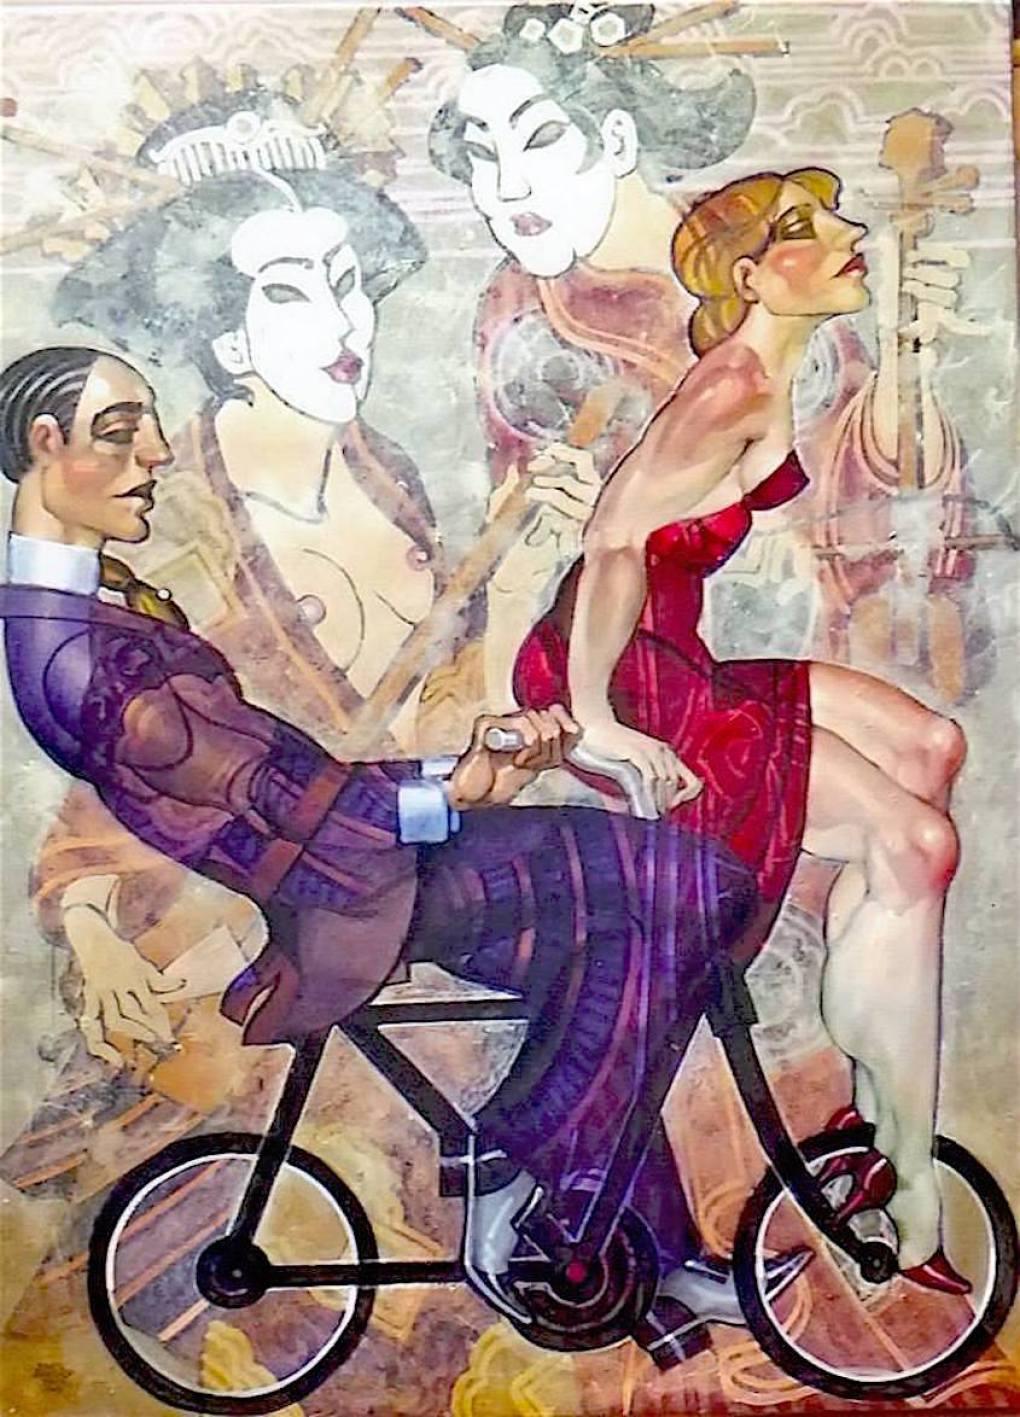 juarez-machado-pittore_urbancycling_2